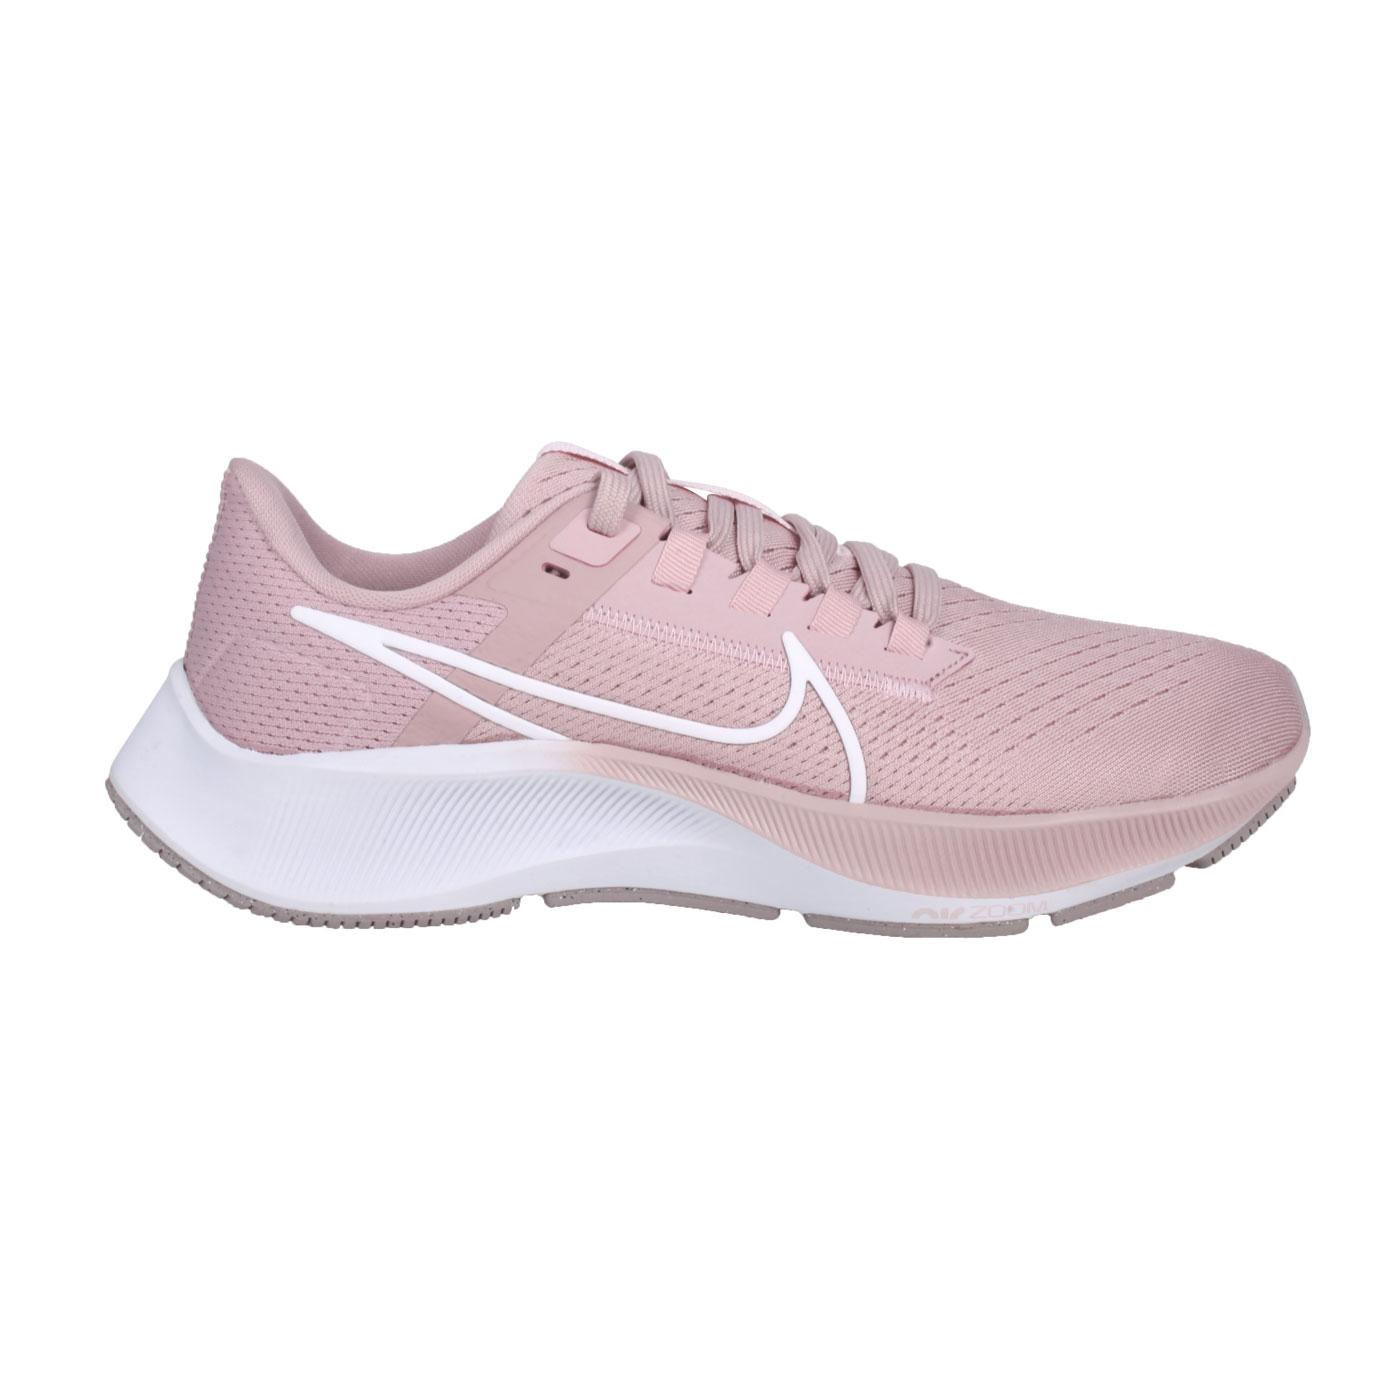 NIKE 女款慢跑鞋  @WMNS AIR ZOOM PEGASUS 38@CW7358-601 - 粉紅白